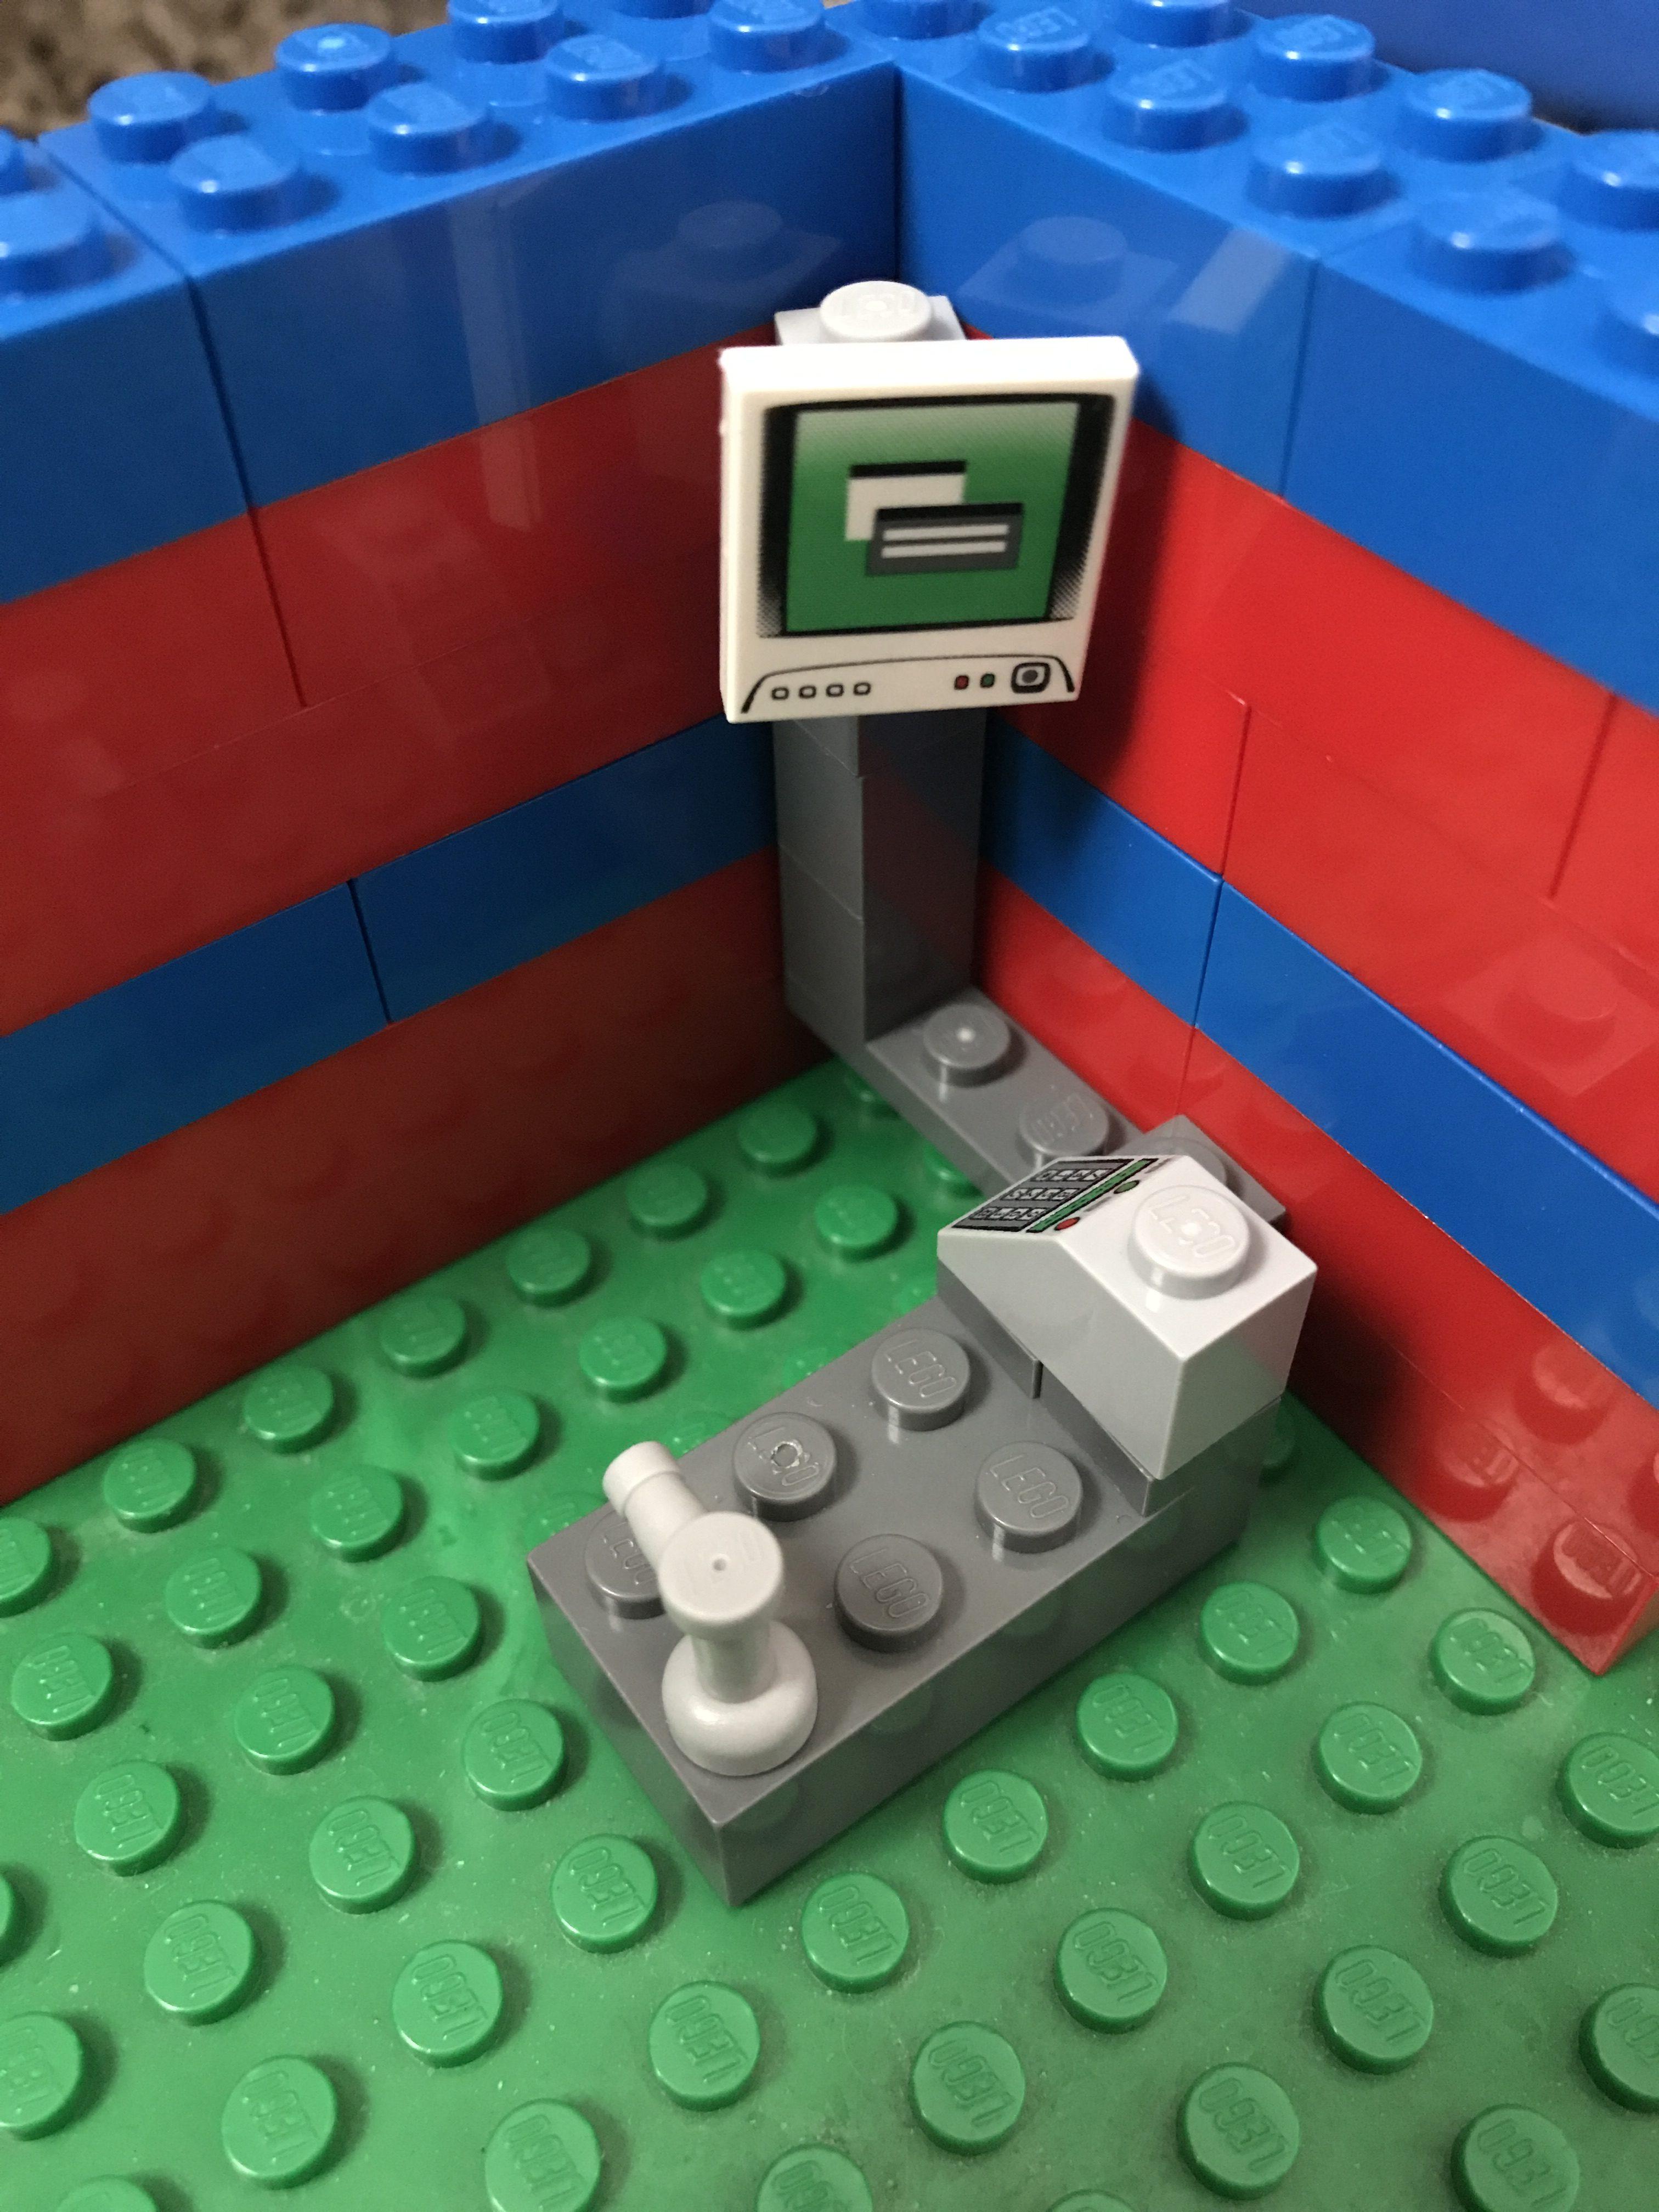 Lego Store Checkout Station